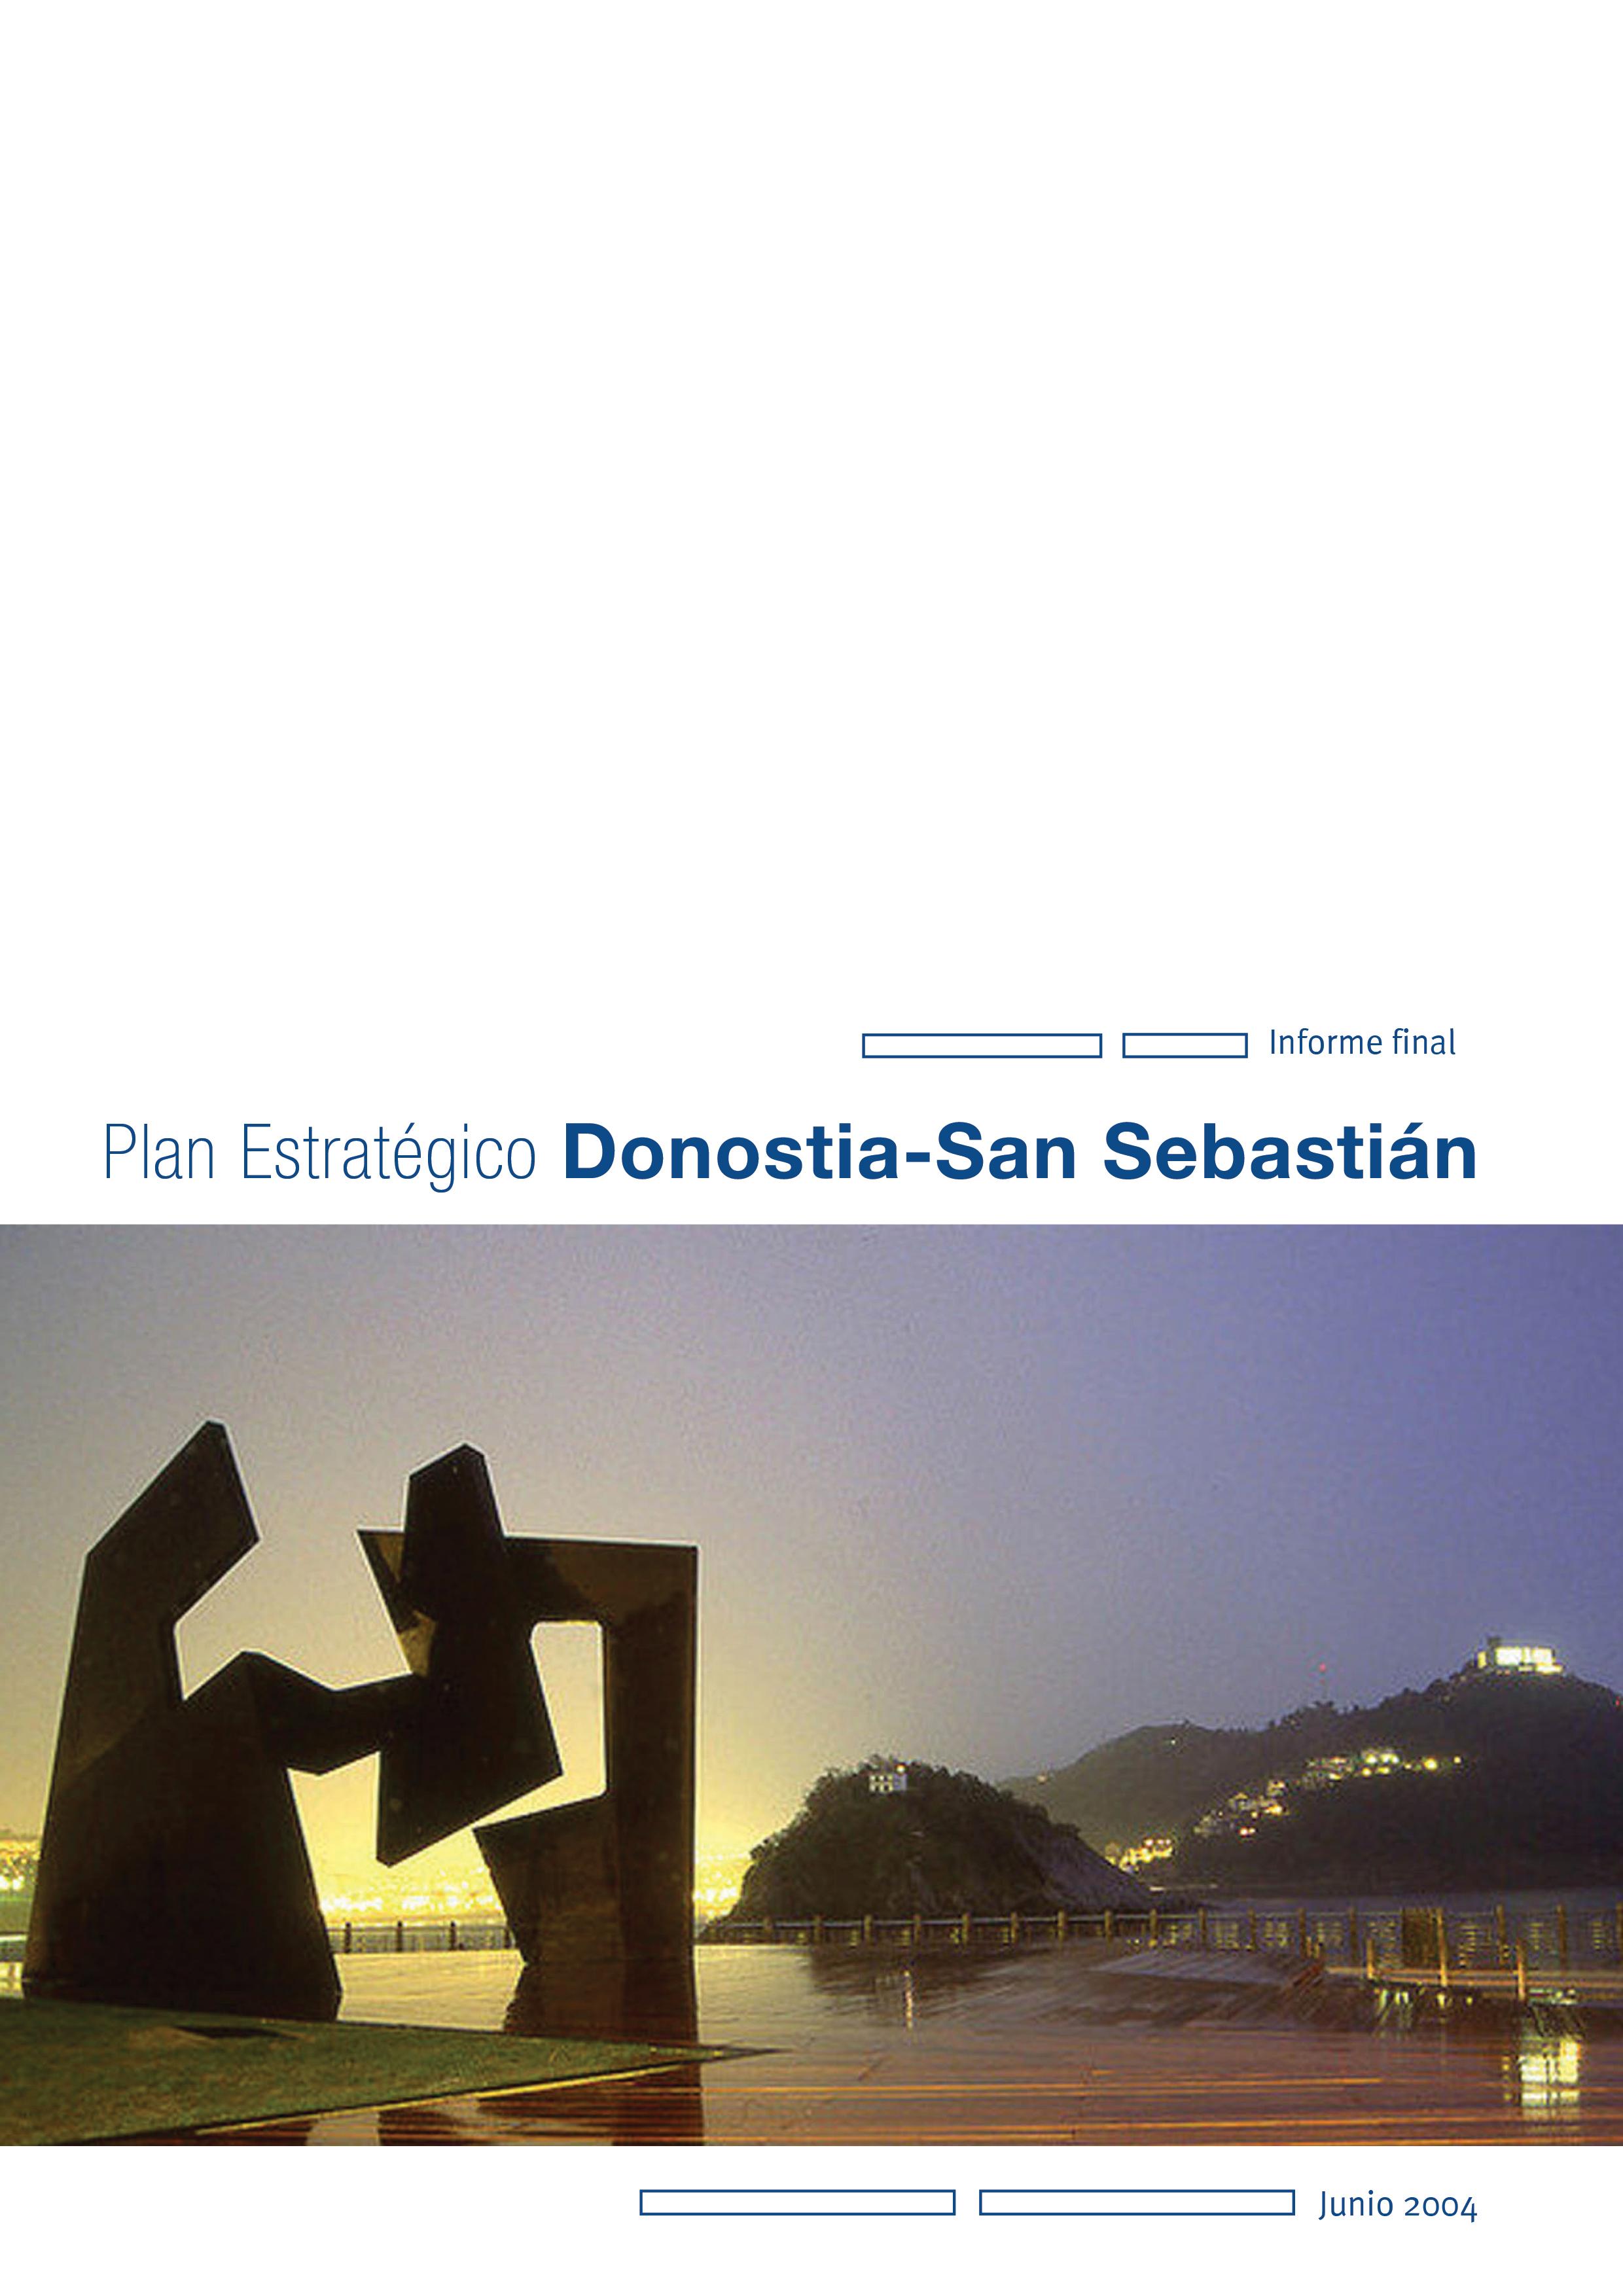 Plan Estratégico de Donostia/San Sebastián 2010. Documento final